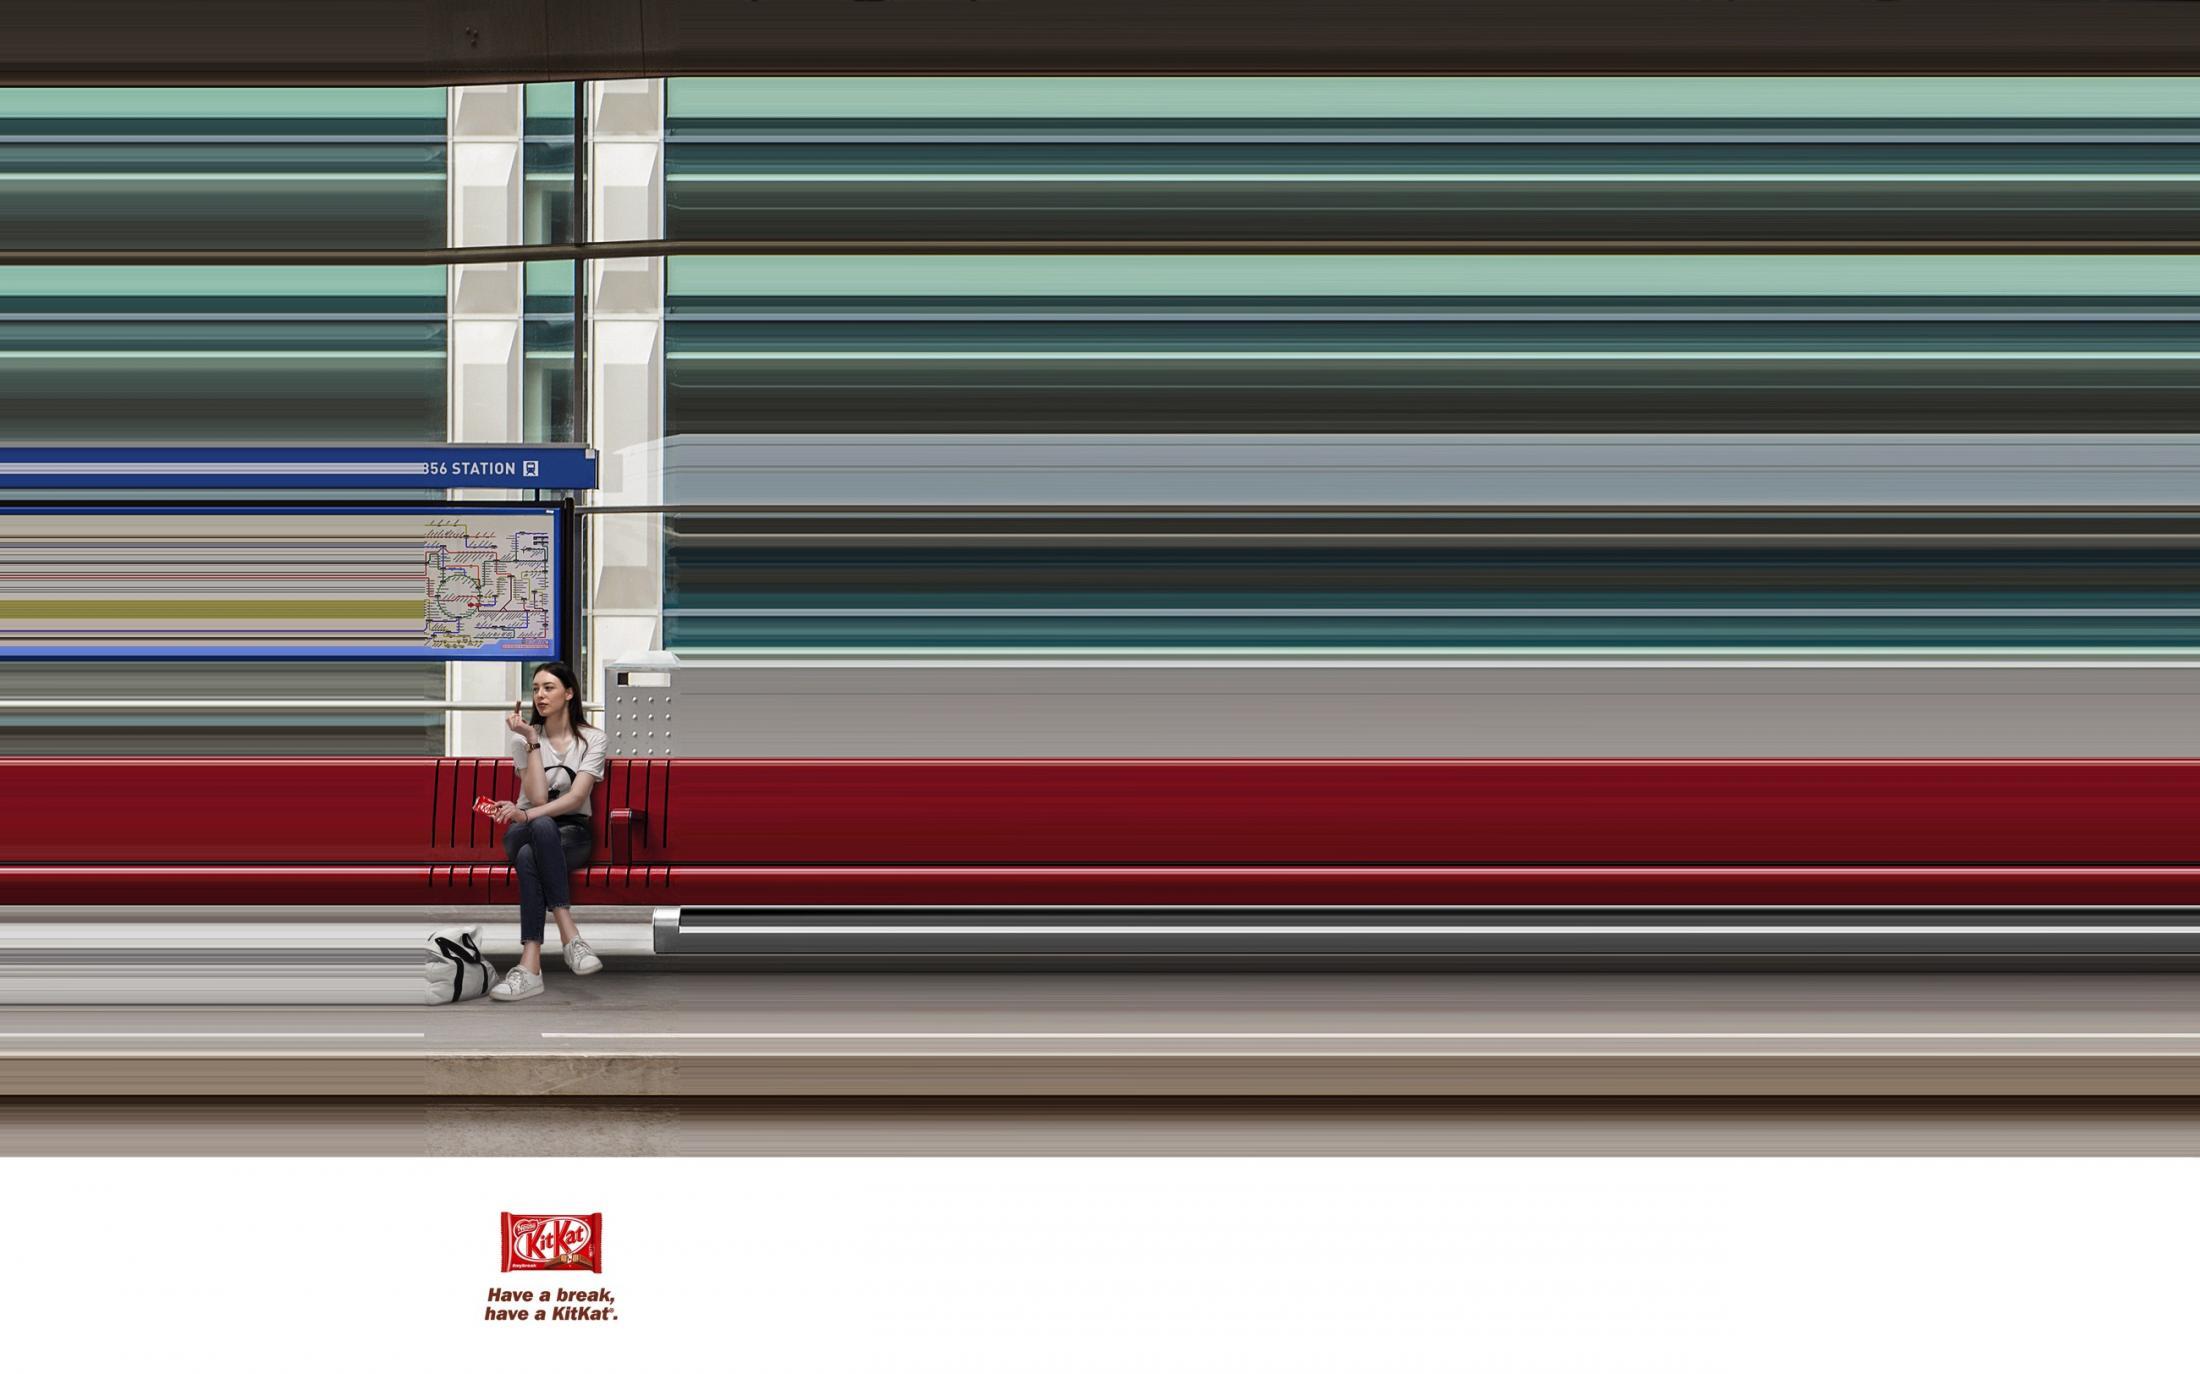 14.Metro Station 2600.[大嘴收纳屋].jpg